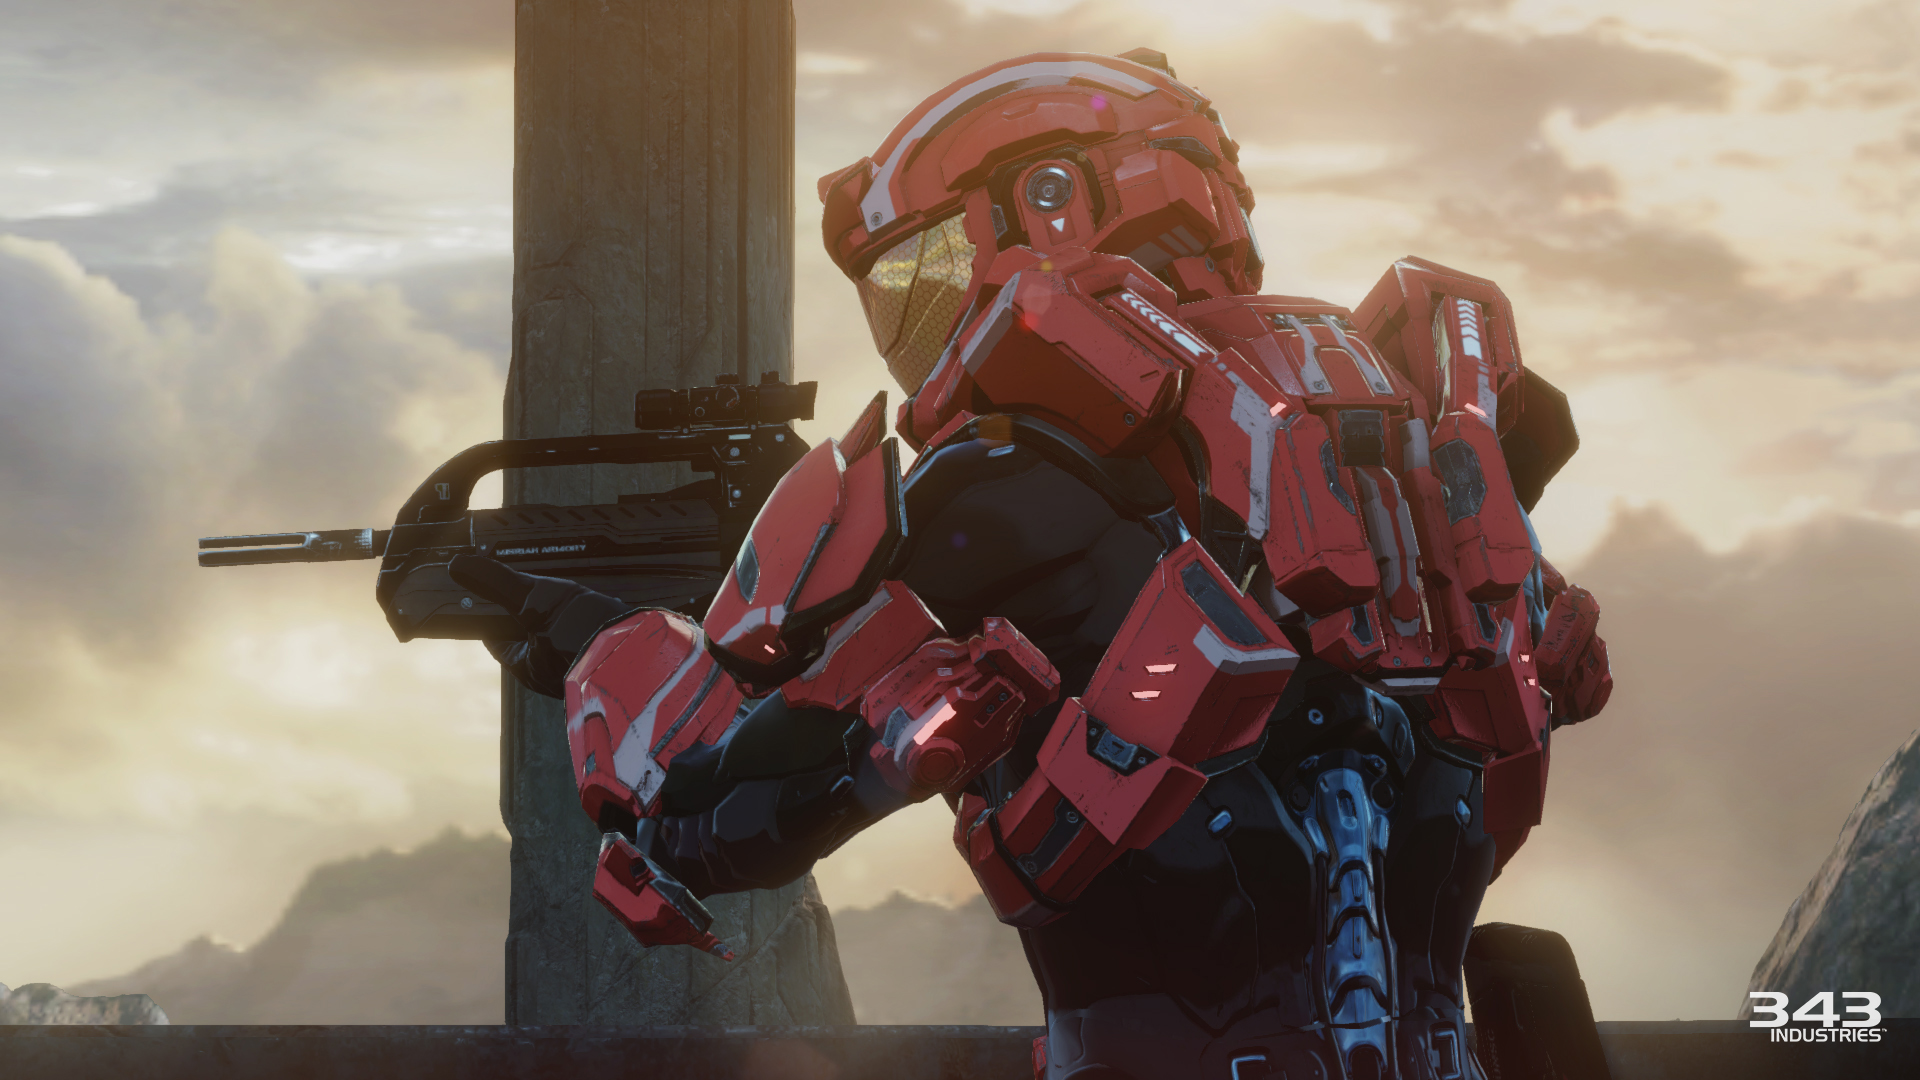 Vyšla kampaň Halo 3: ODST do Halo: The Master Chief Collection 109409